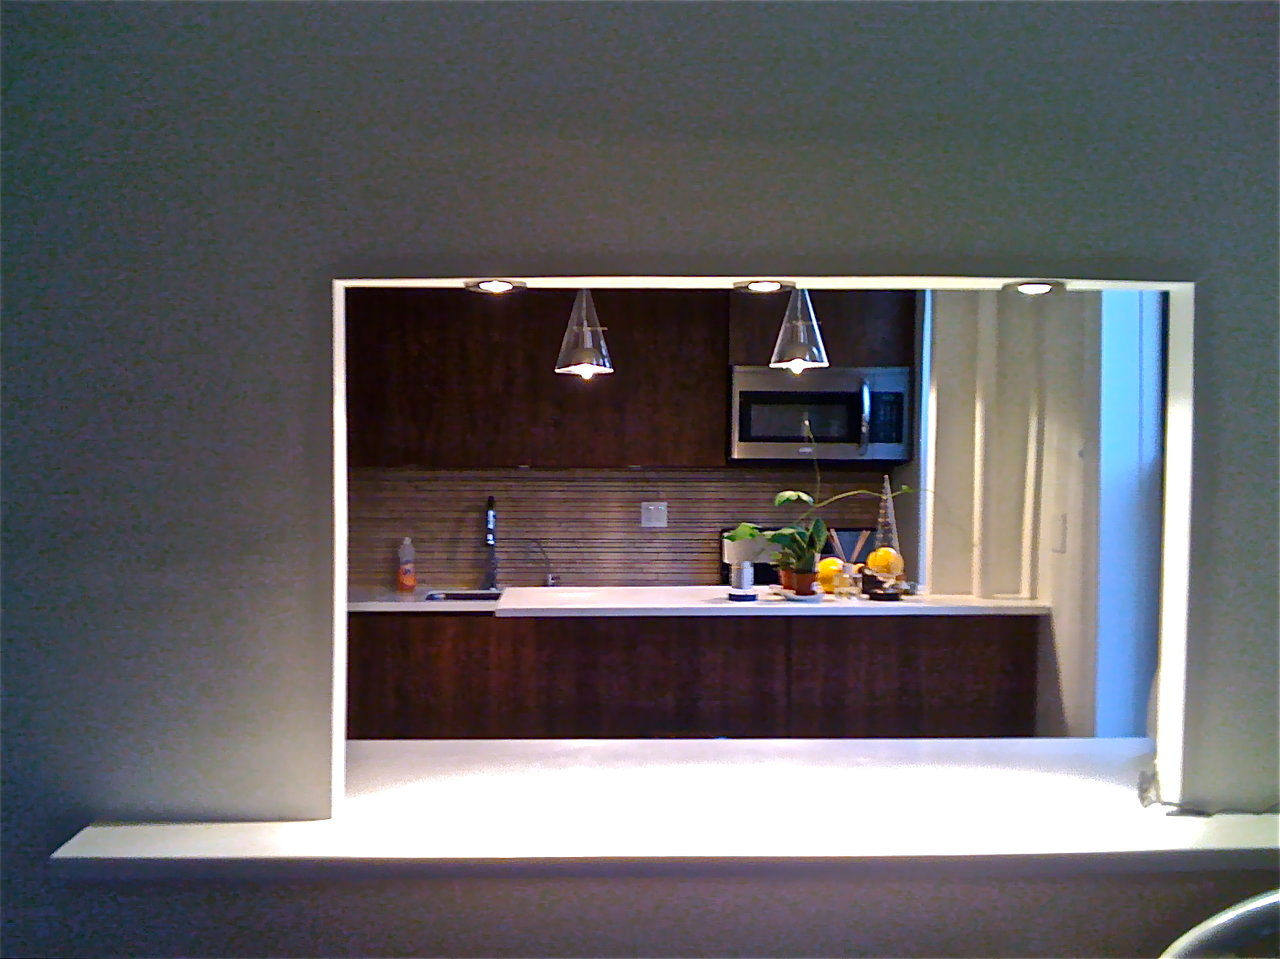 kitchen counter window. Kitchen Counter Window S